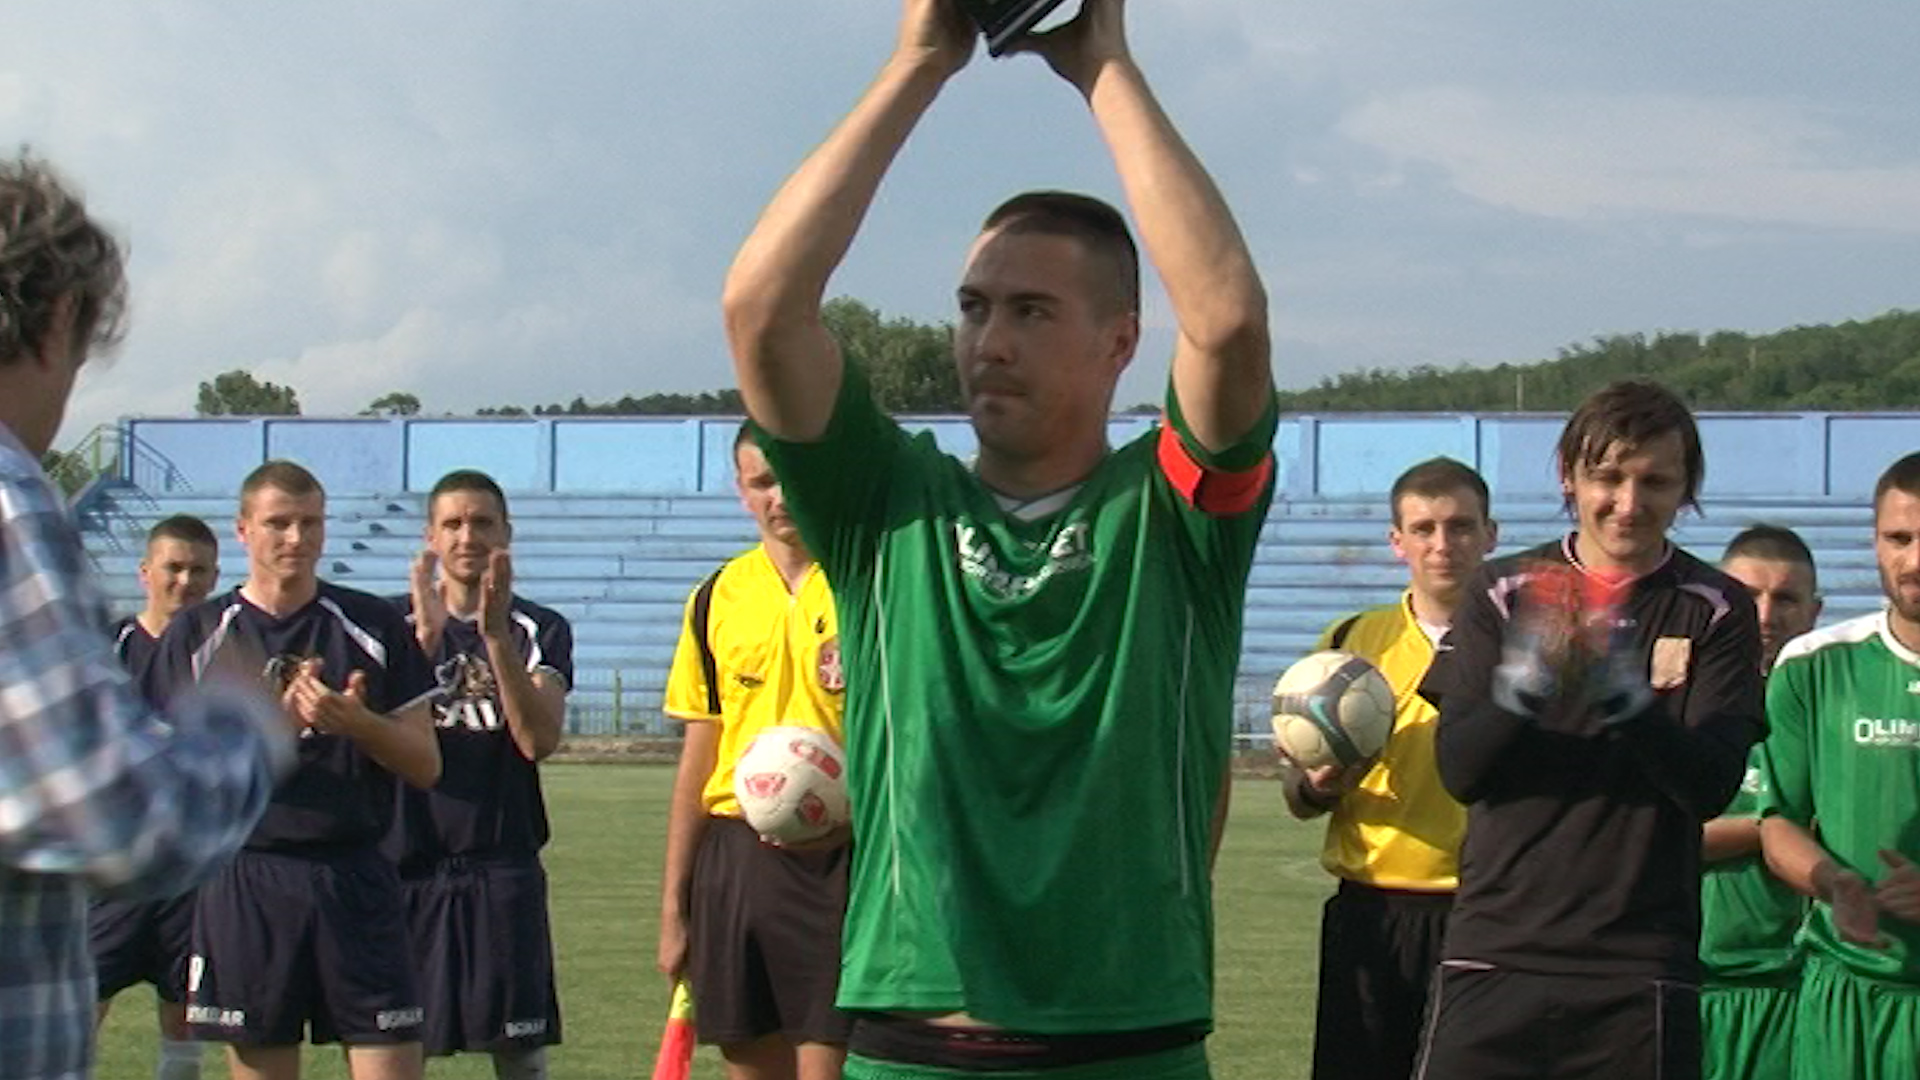 Paraćinac Miloš Ivanković profesionalno igra fudbal na Islandu